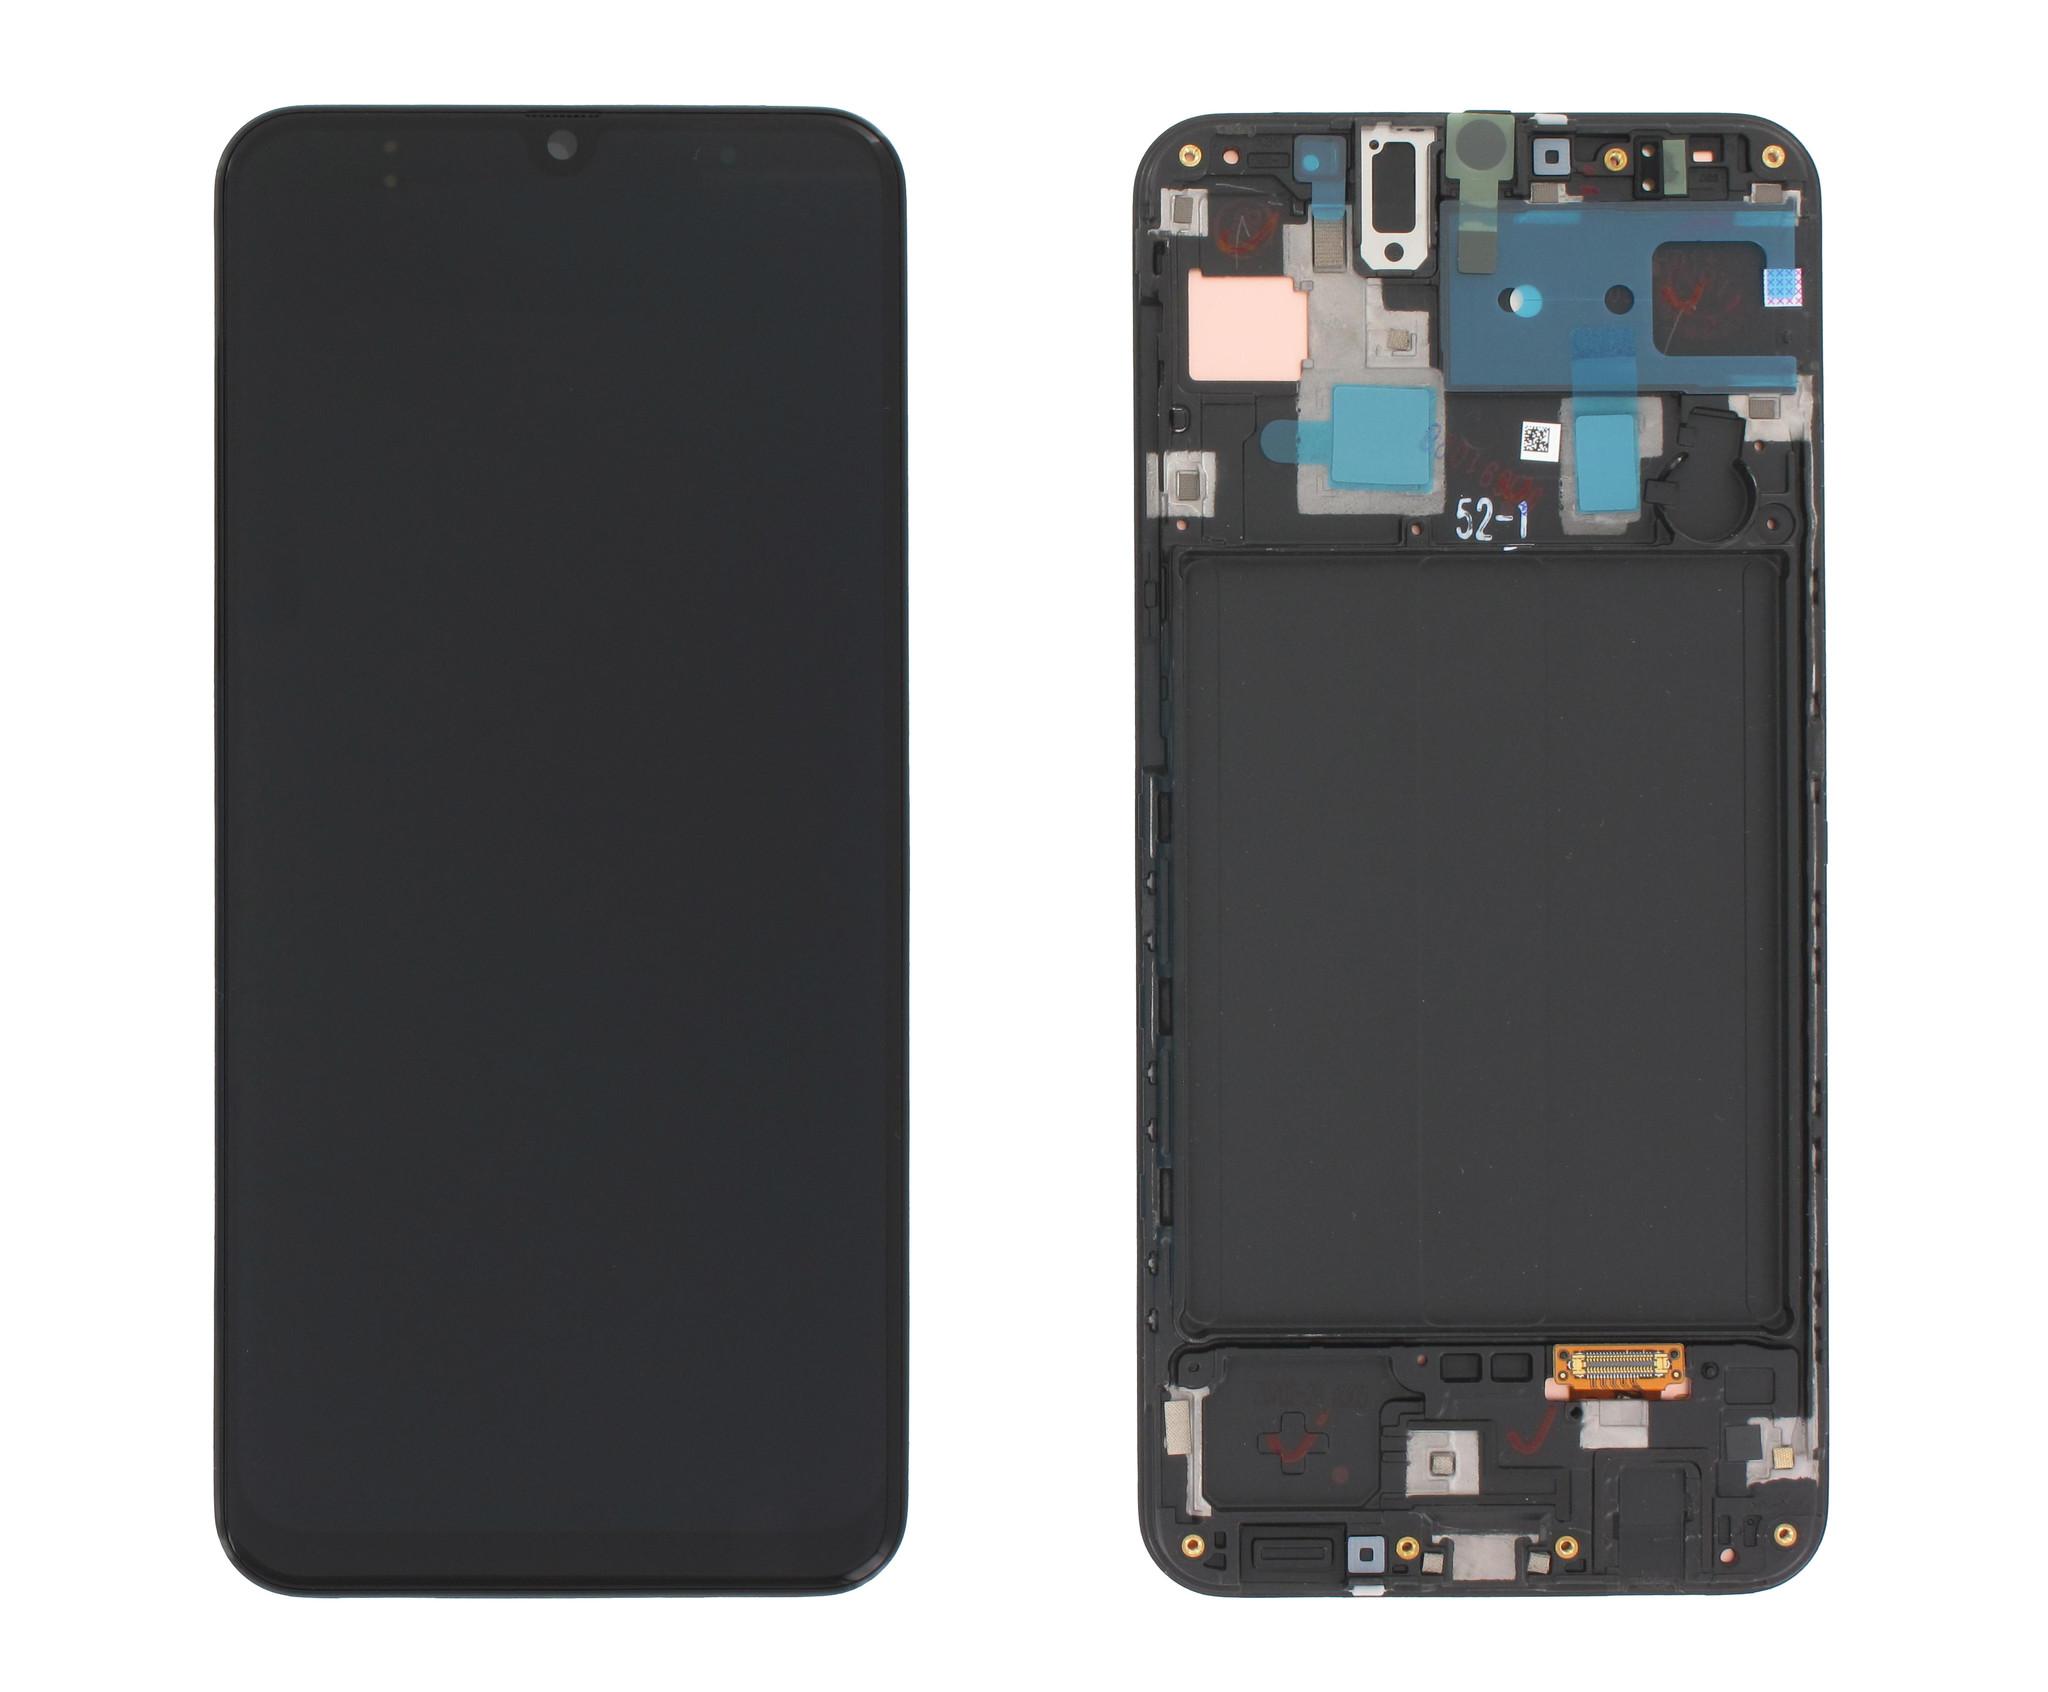 Samsung A305F/DS Galaxy A30 Display, Black, GH82-19202A;GH82-19725A